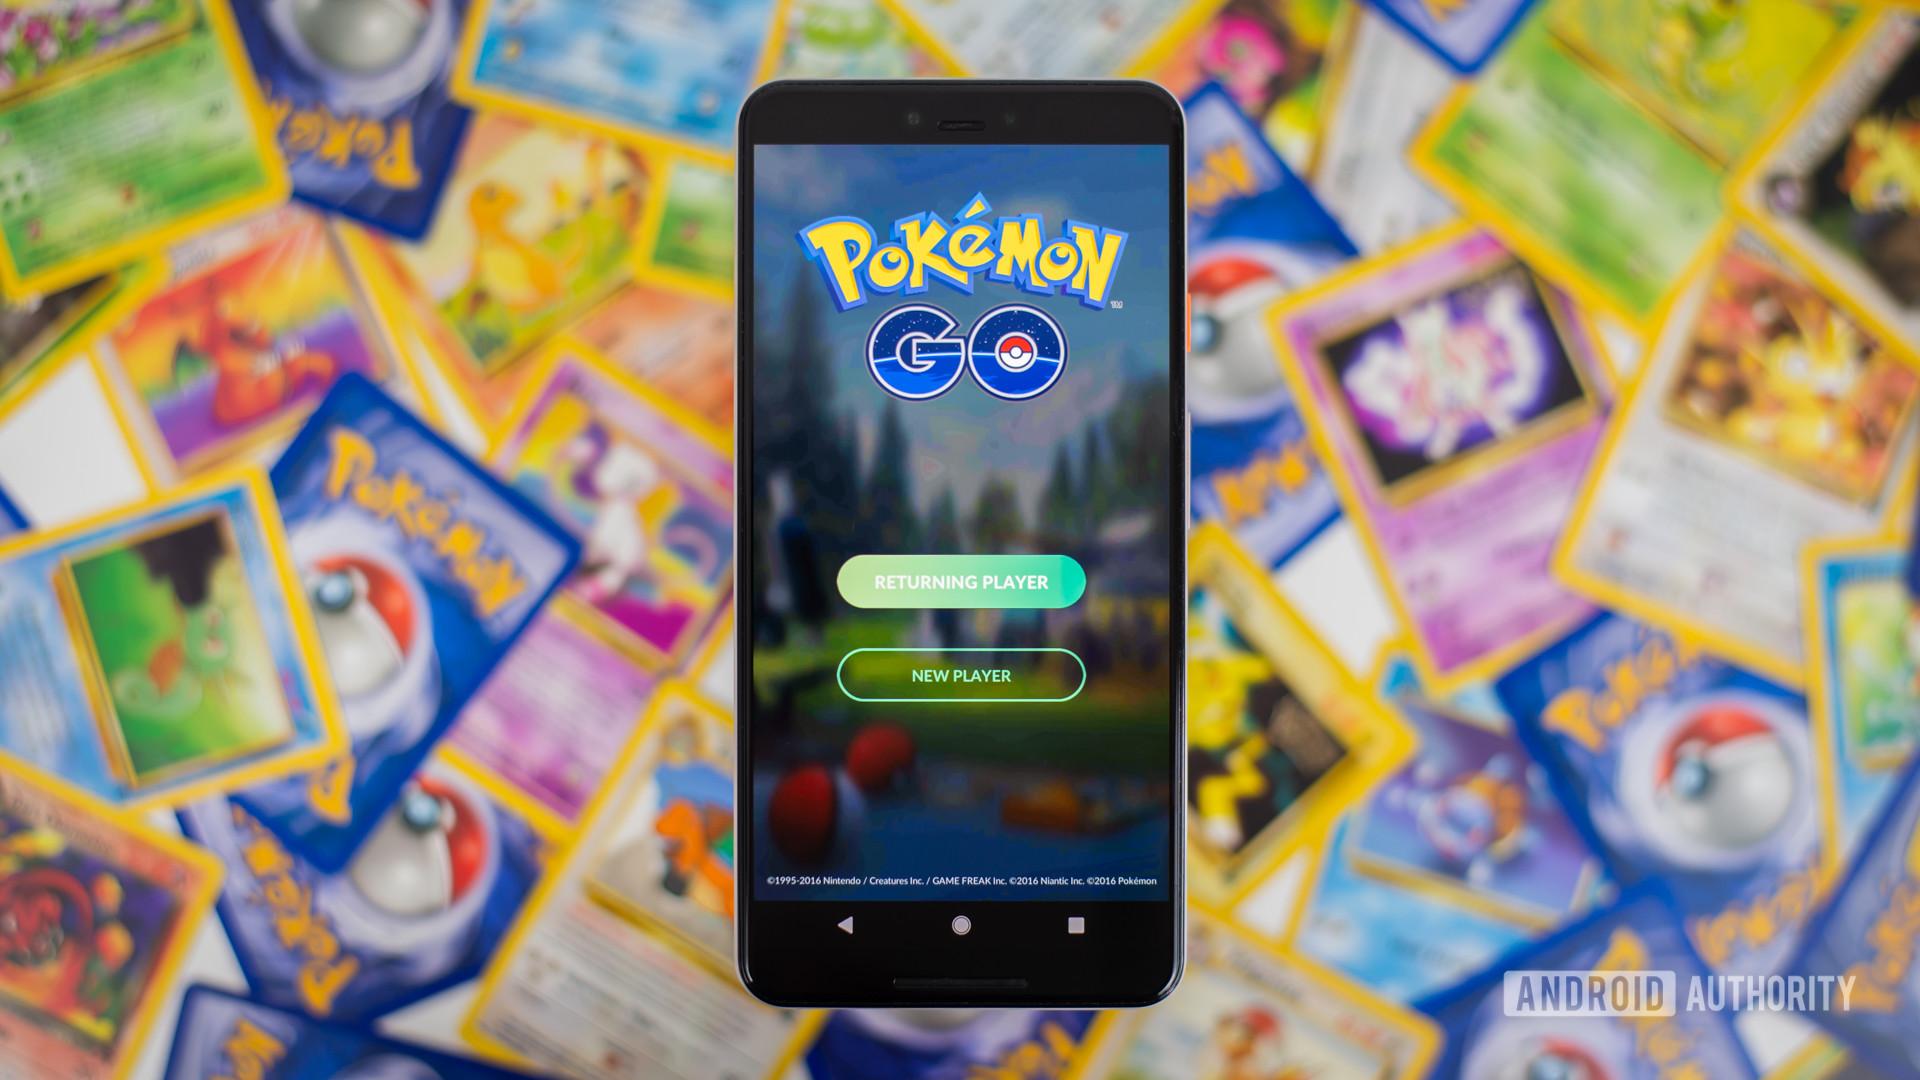 Pokemon Go stock photo 1